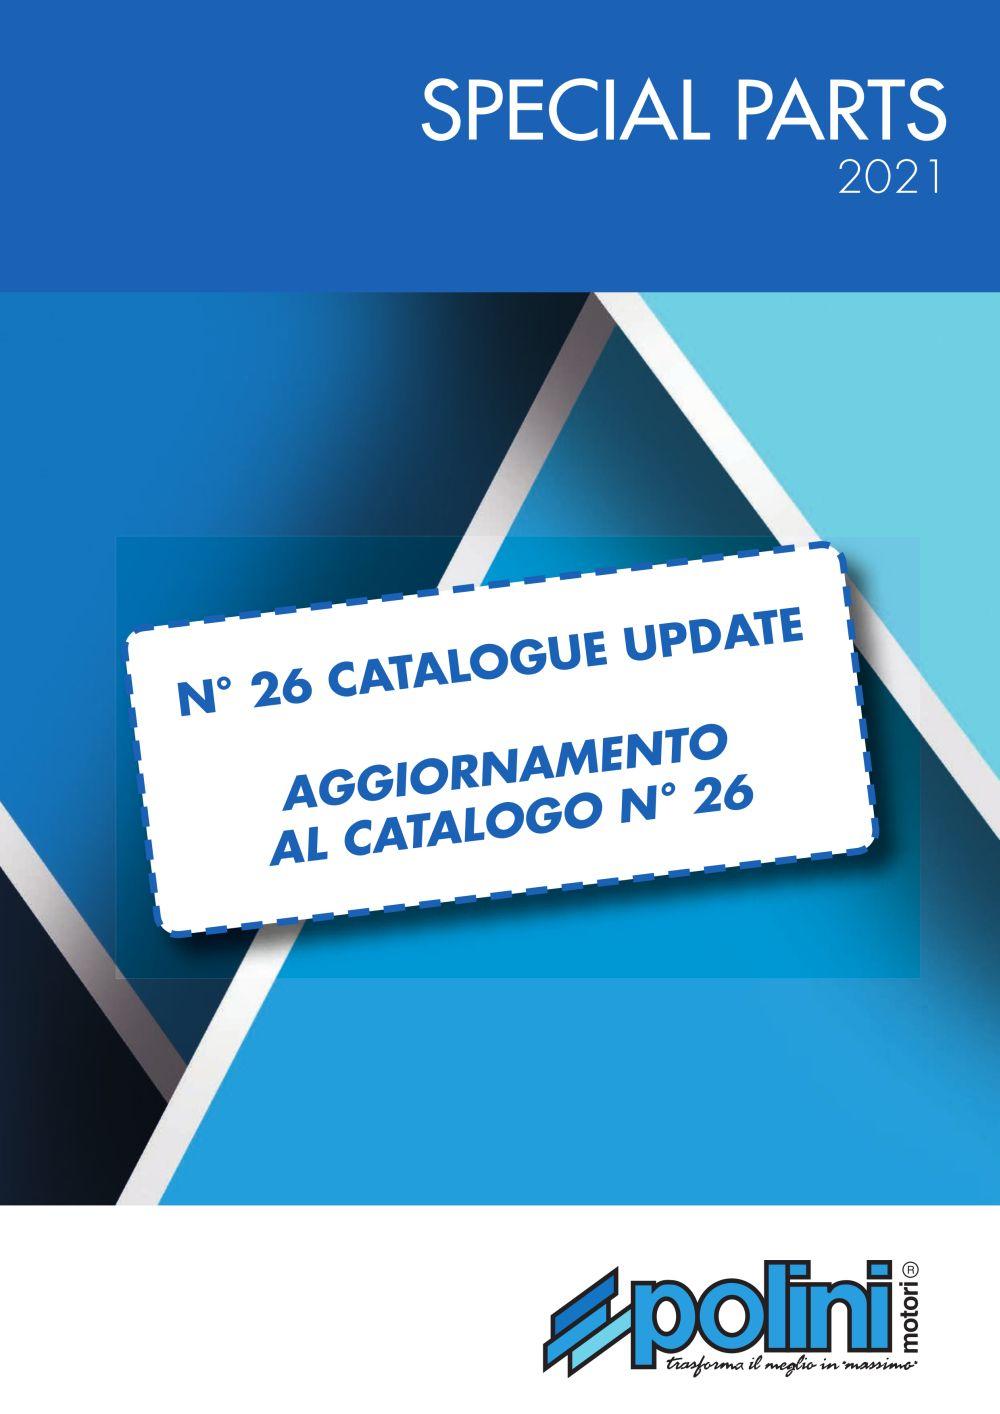 Gesamtkatalog-Polini-Neuheiten-2021-Cover-1000px